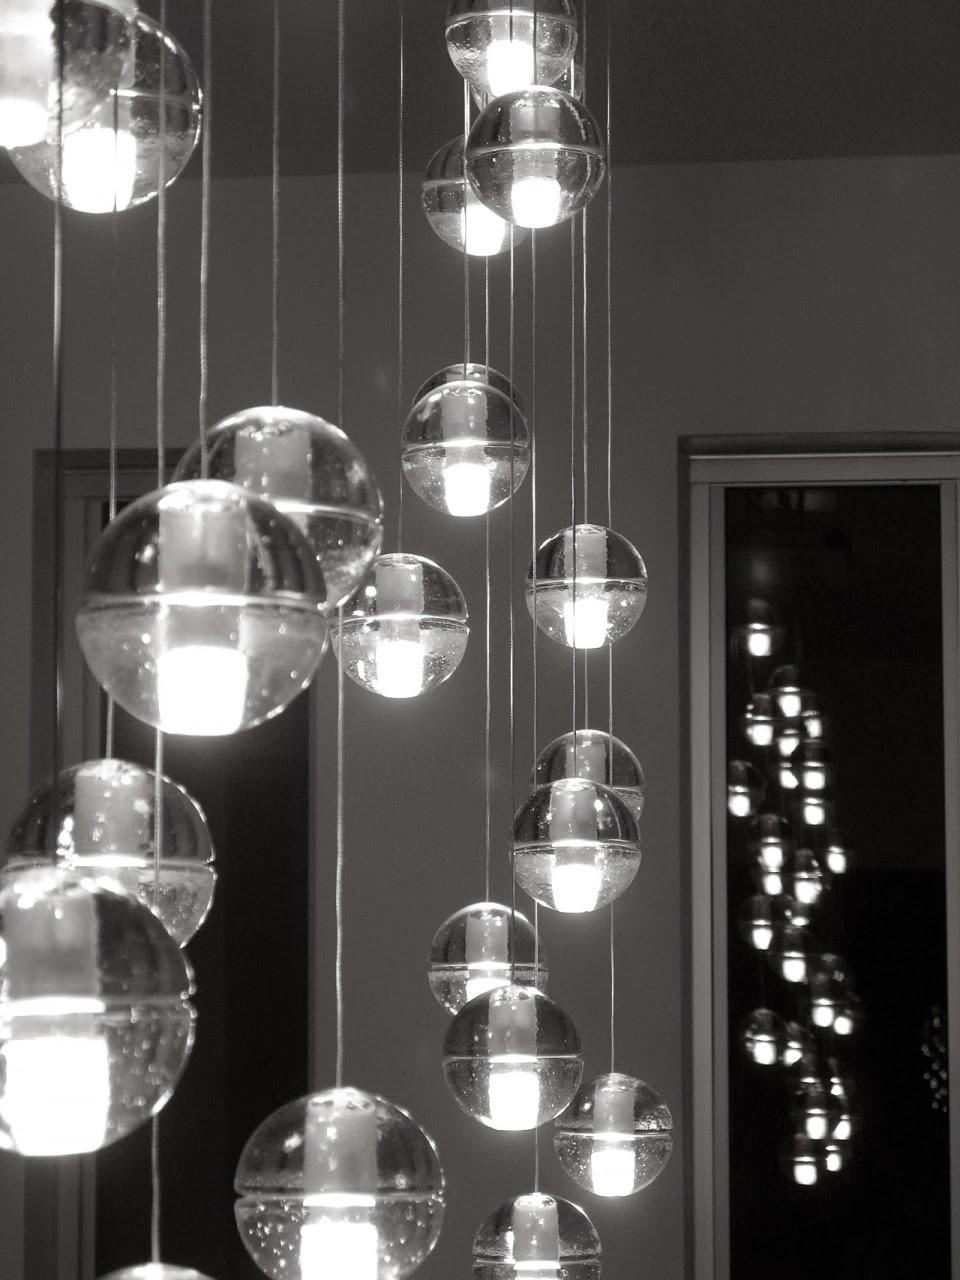 Mi casa magicas lamparas de cristal - Lamparas con botes de cristal ...